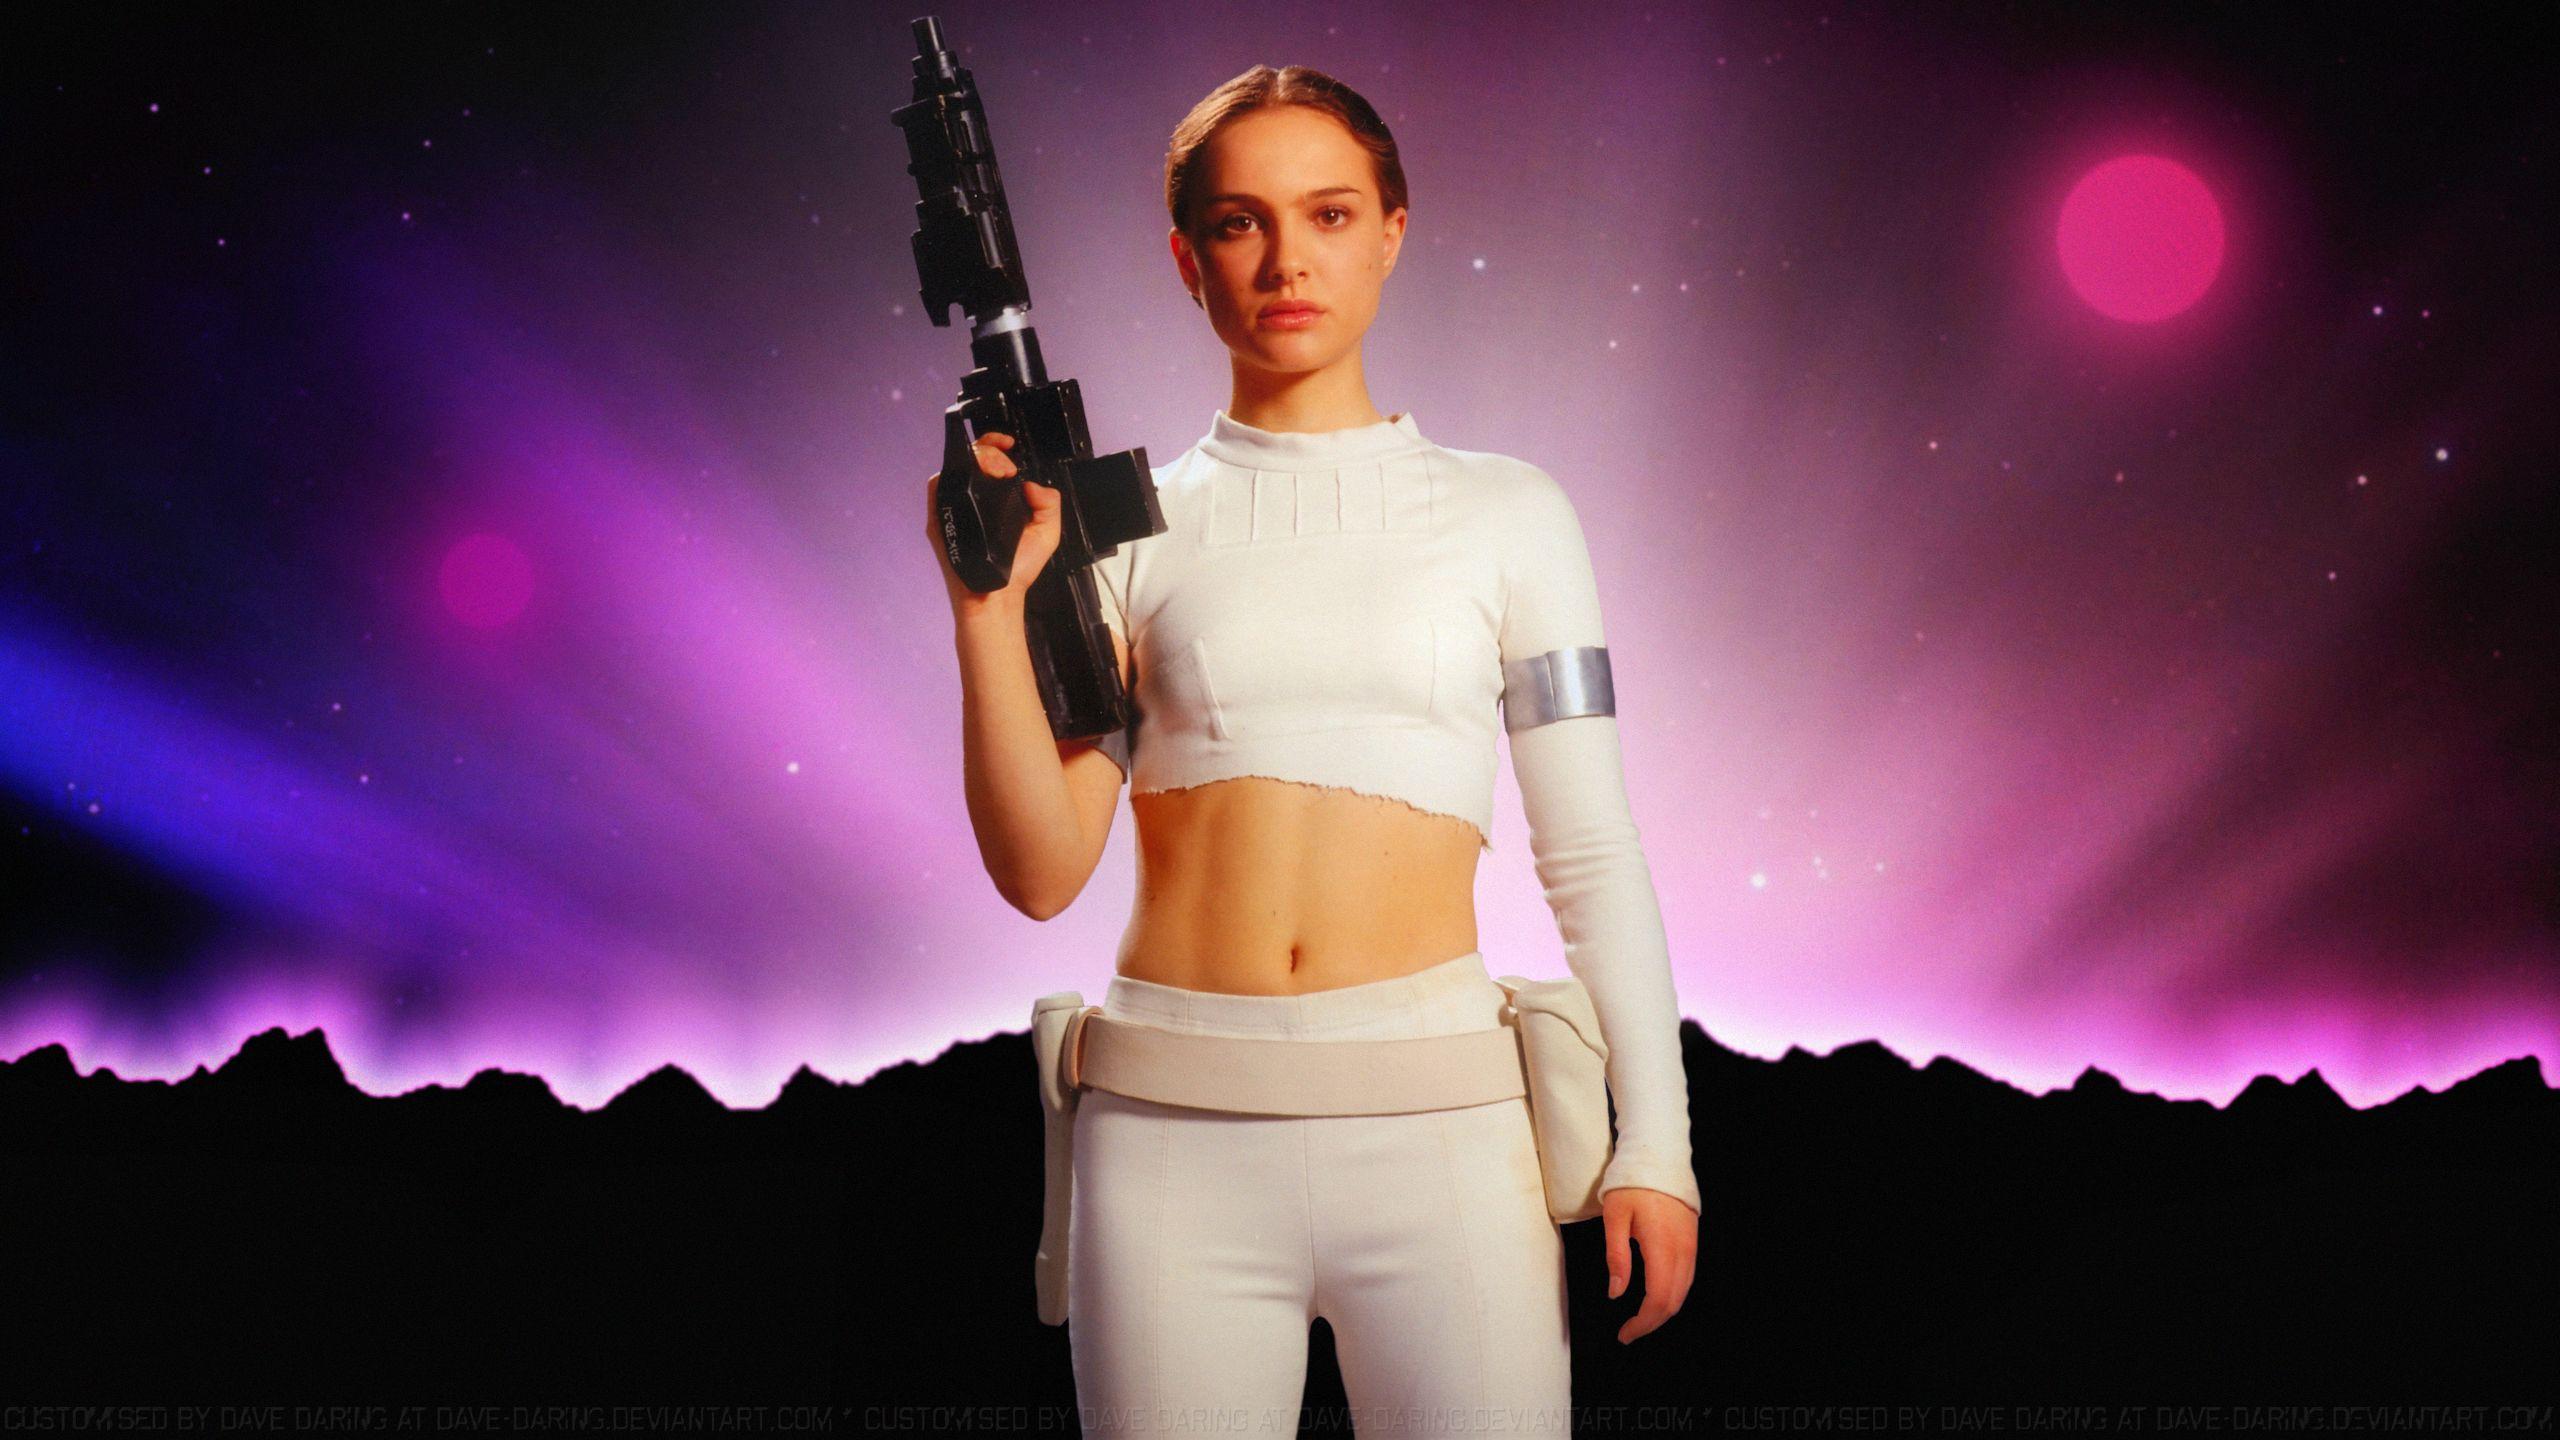 Star wars fake porn fucked comic